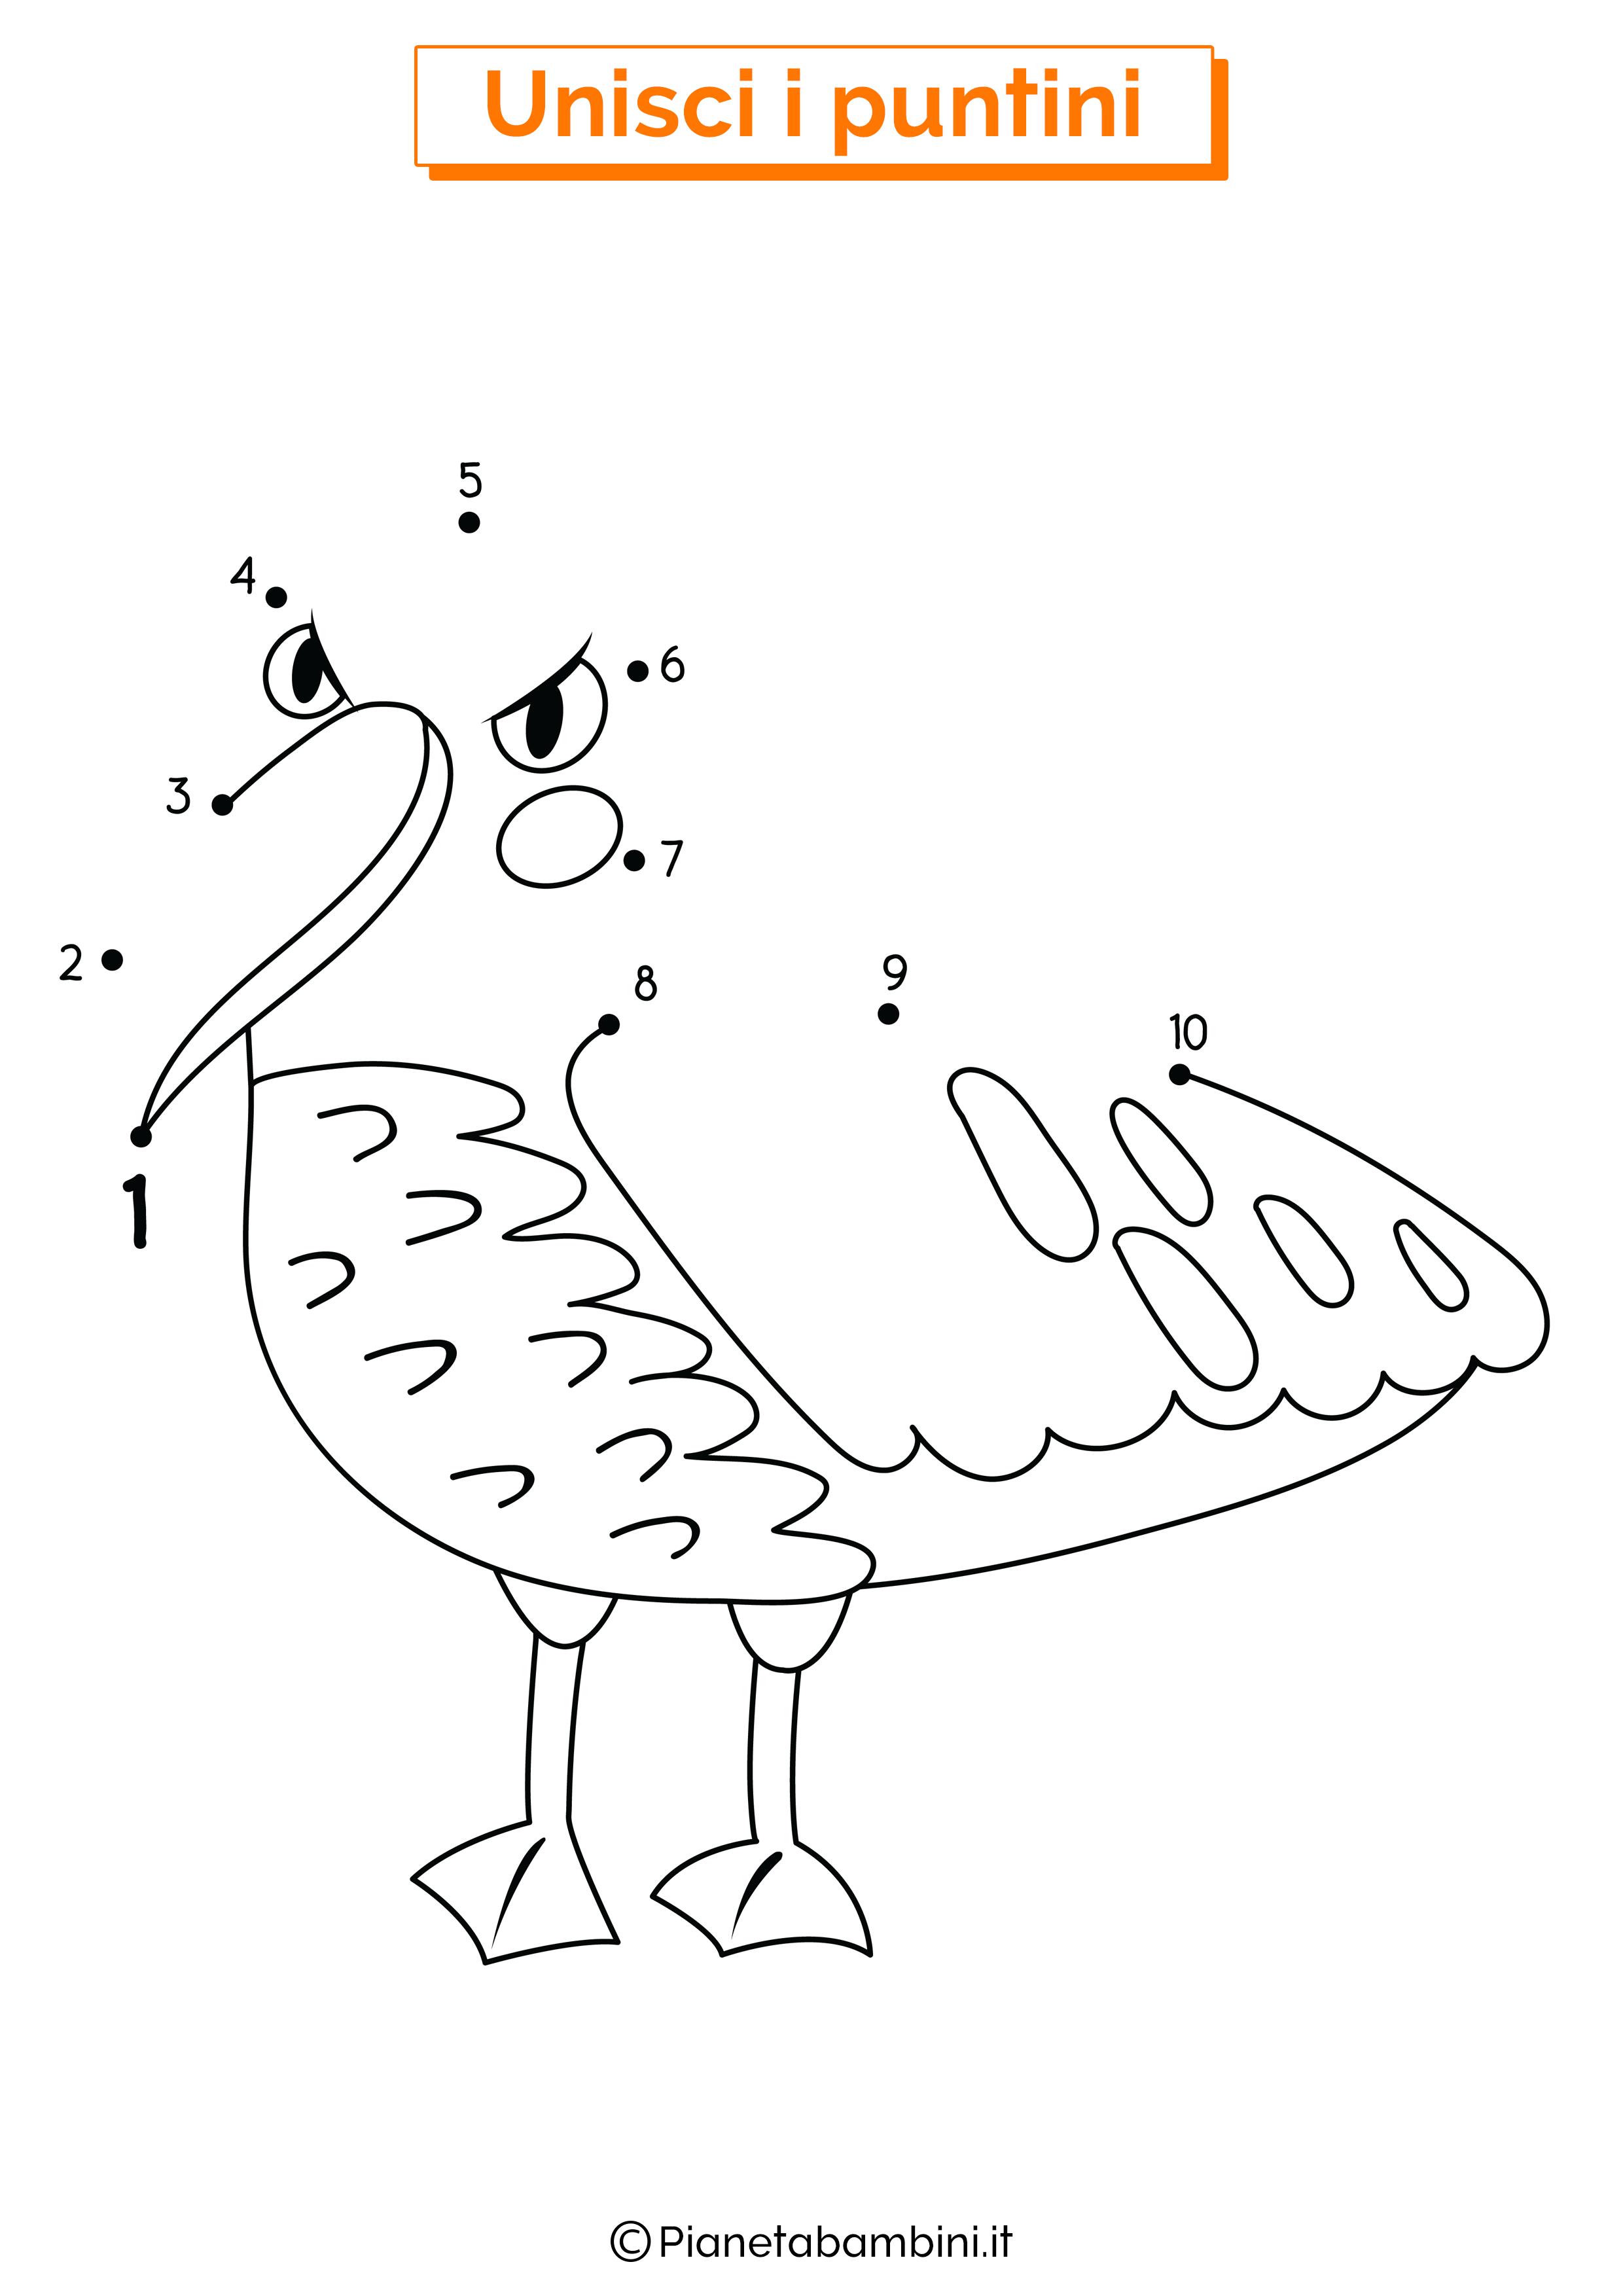 Disegno unisci i puntini da 1 a 10 albatros